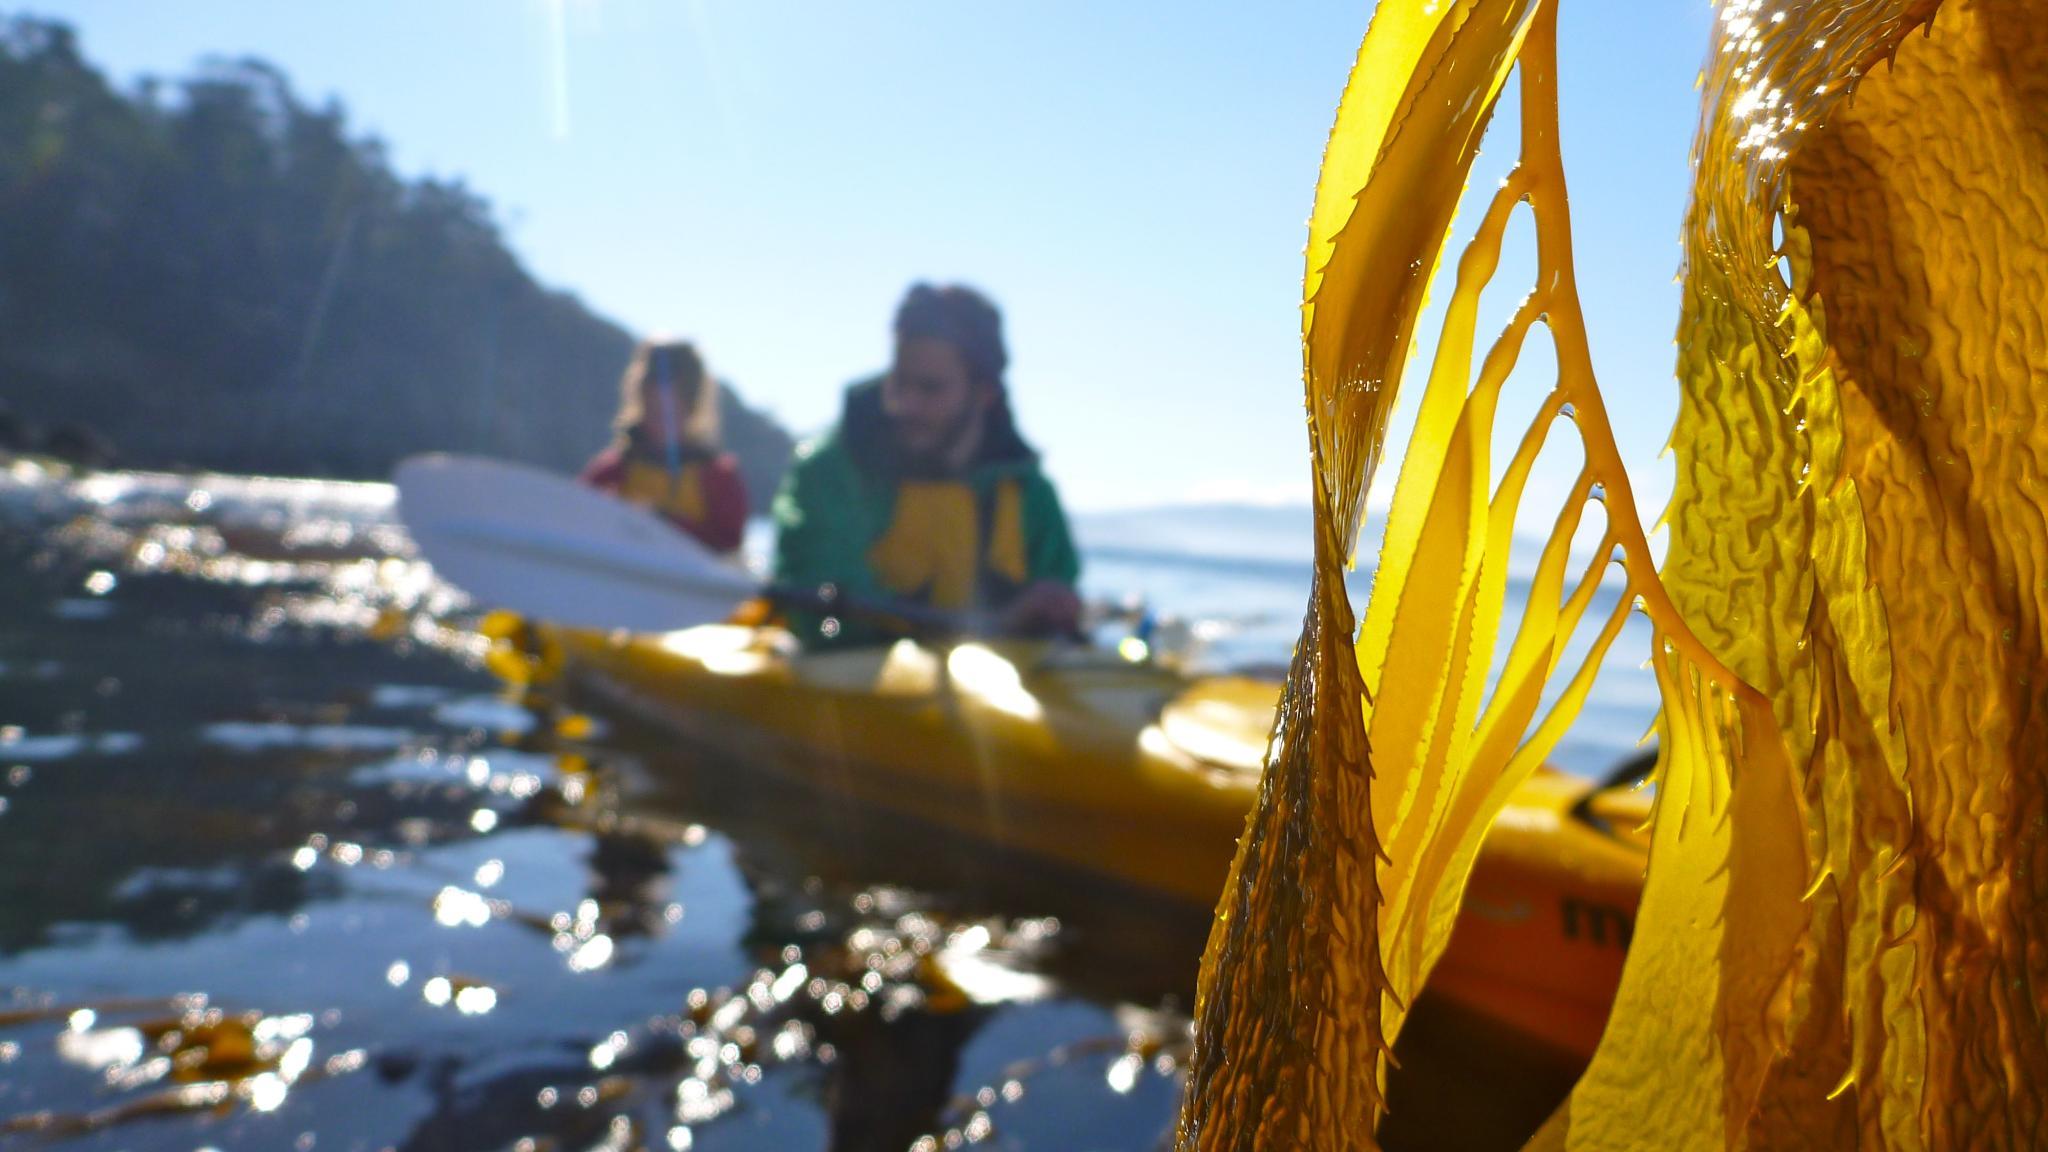 Seaweed in front of kayakers on the Tinderbox coastline